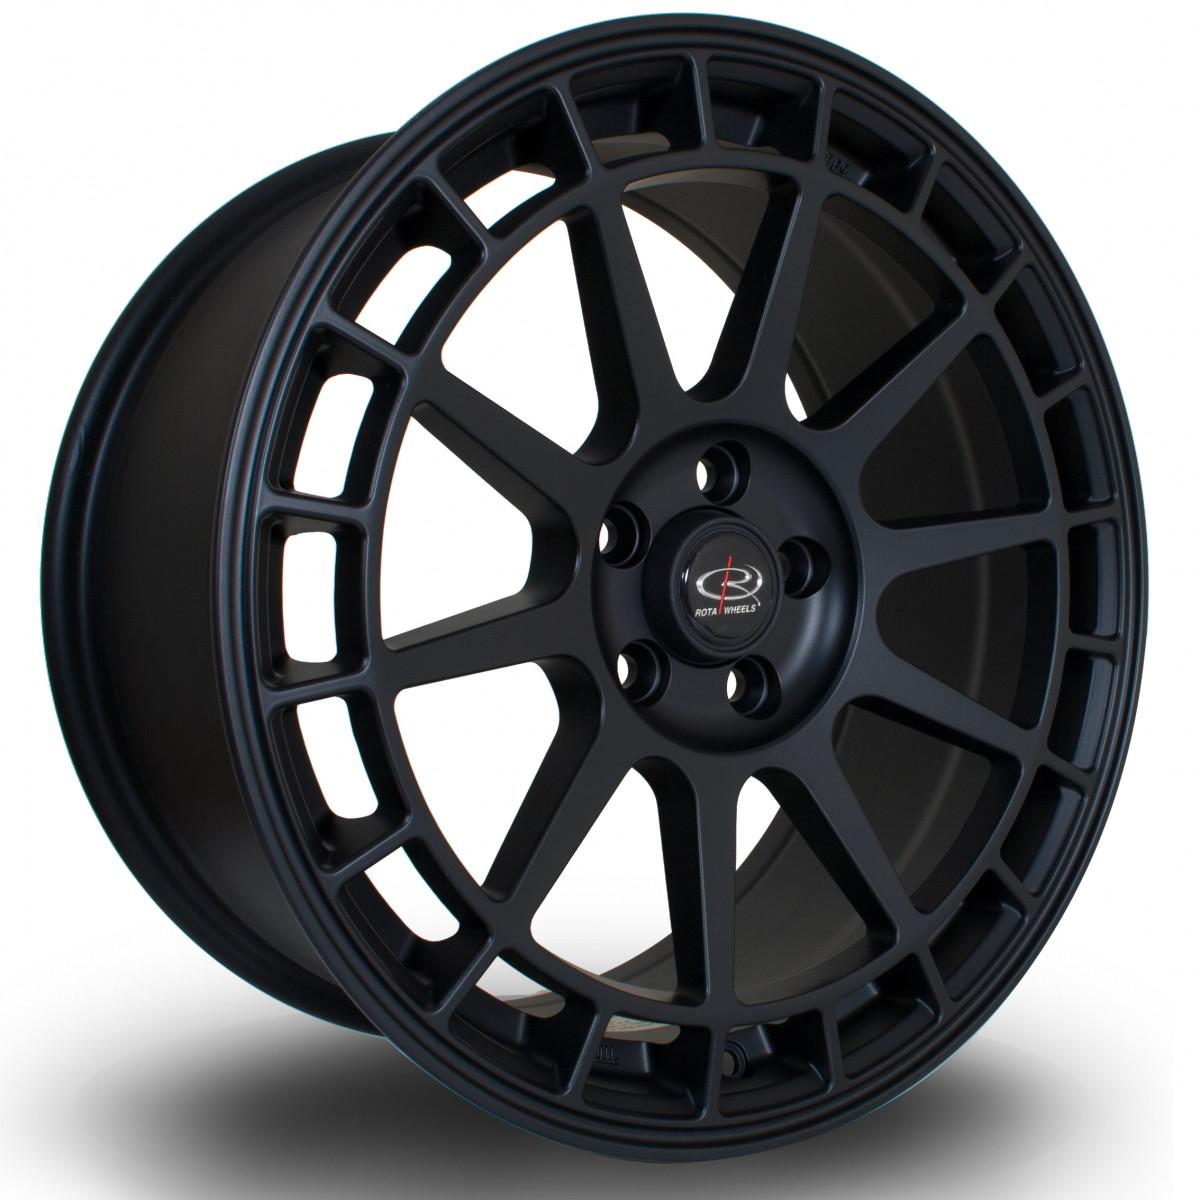 Recce 17x8 4x108 ET40 Flat Black